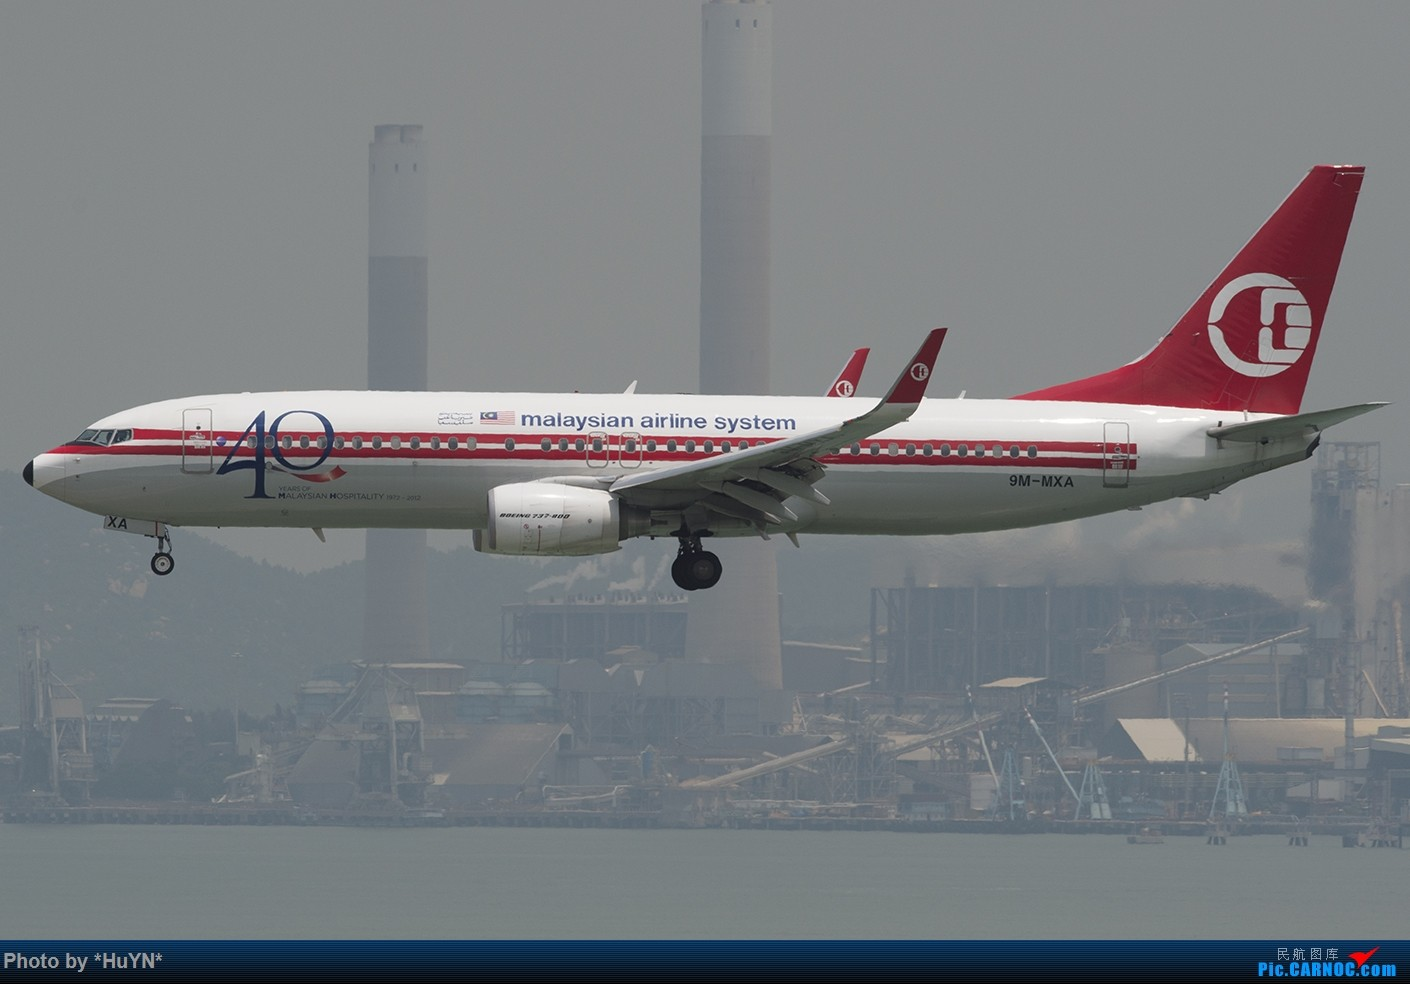 Re:[原创]听说又能审图了我也试试之二 BOEING 737-800 9M-MXA 中国香港赤鱲角国际机场